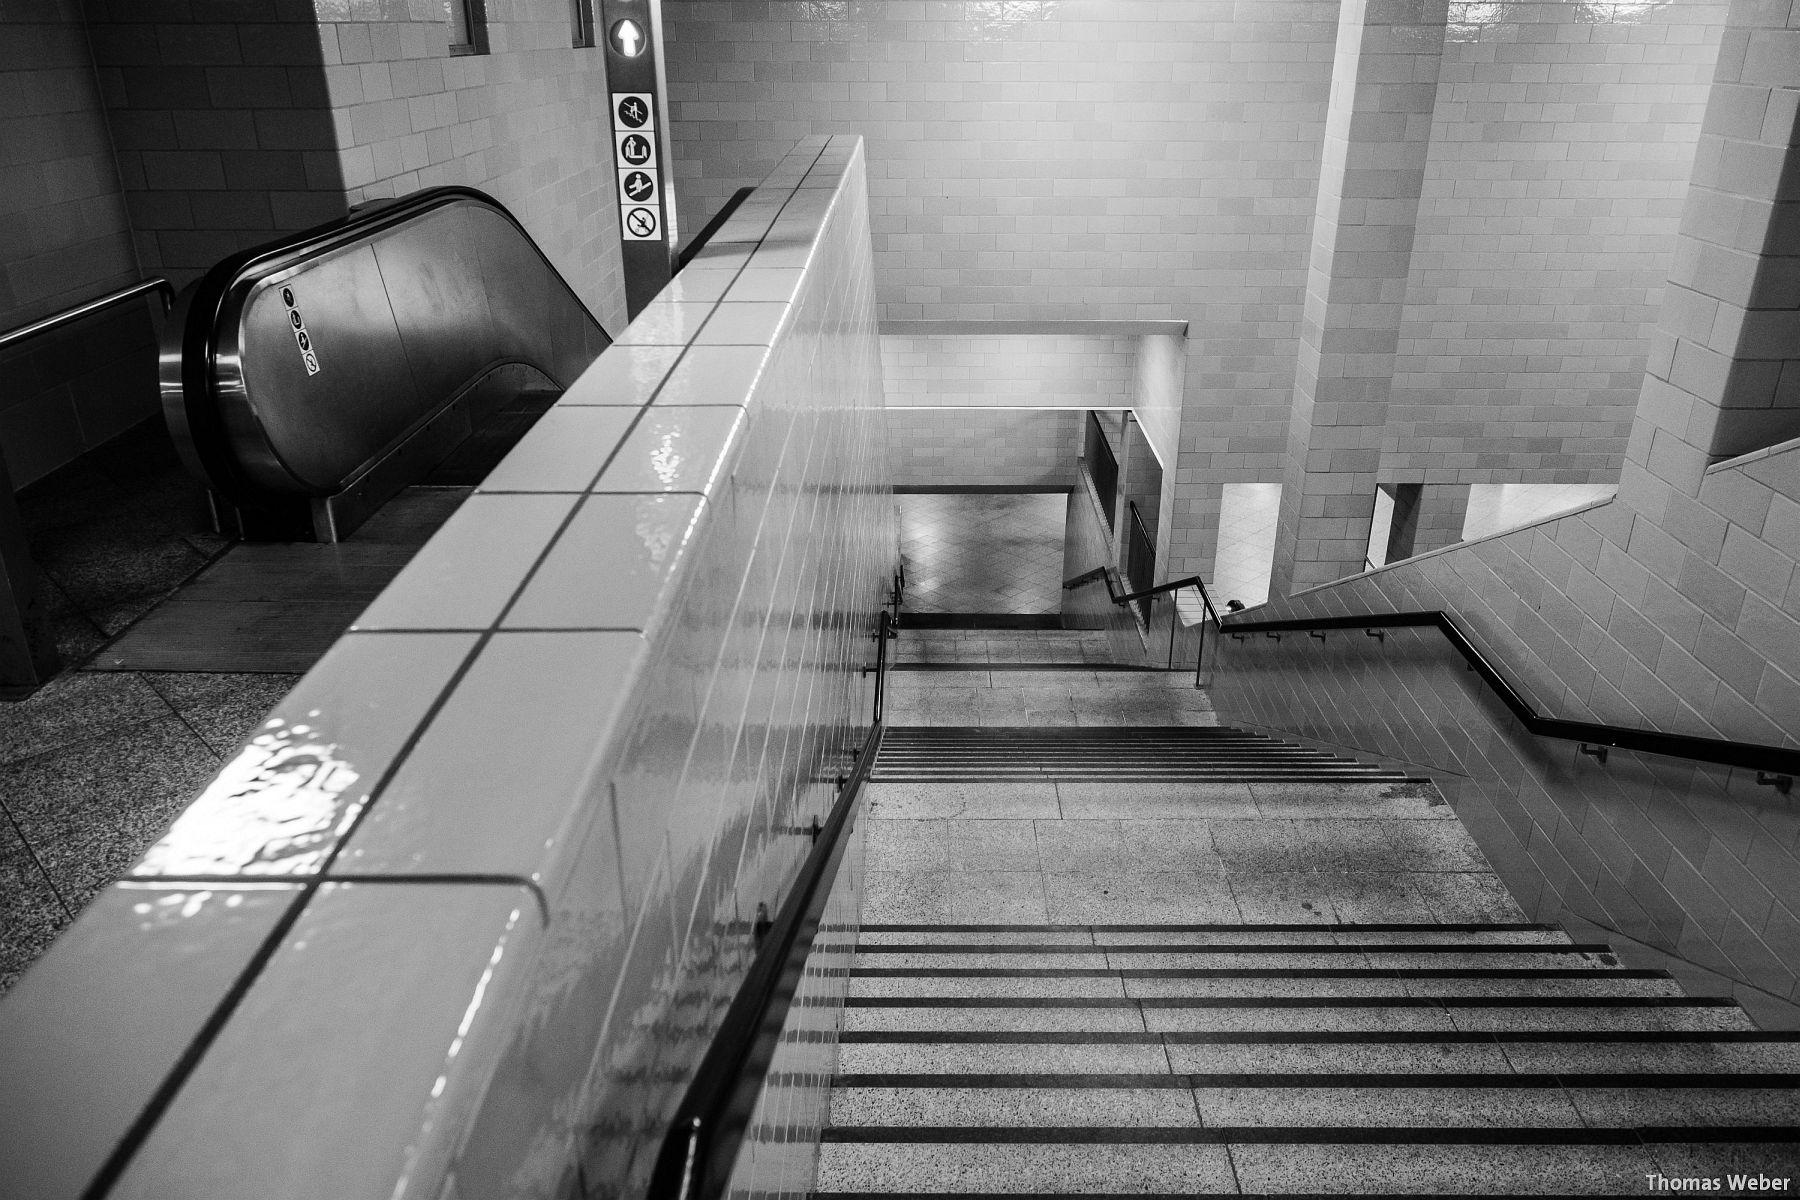 Fotograf Thomas Weber aus Oldenburg: U-Bahn am Alexanderplatz in Berlin